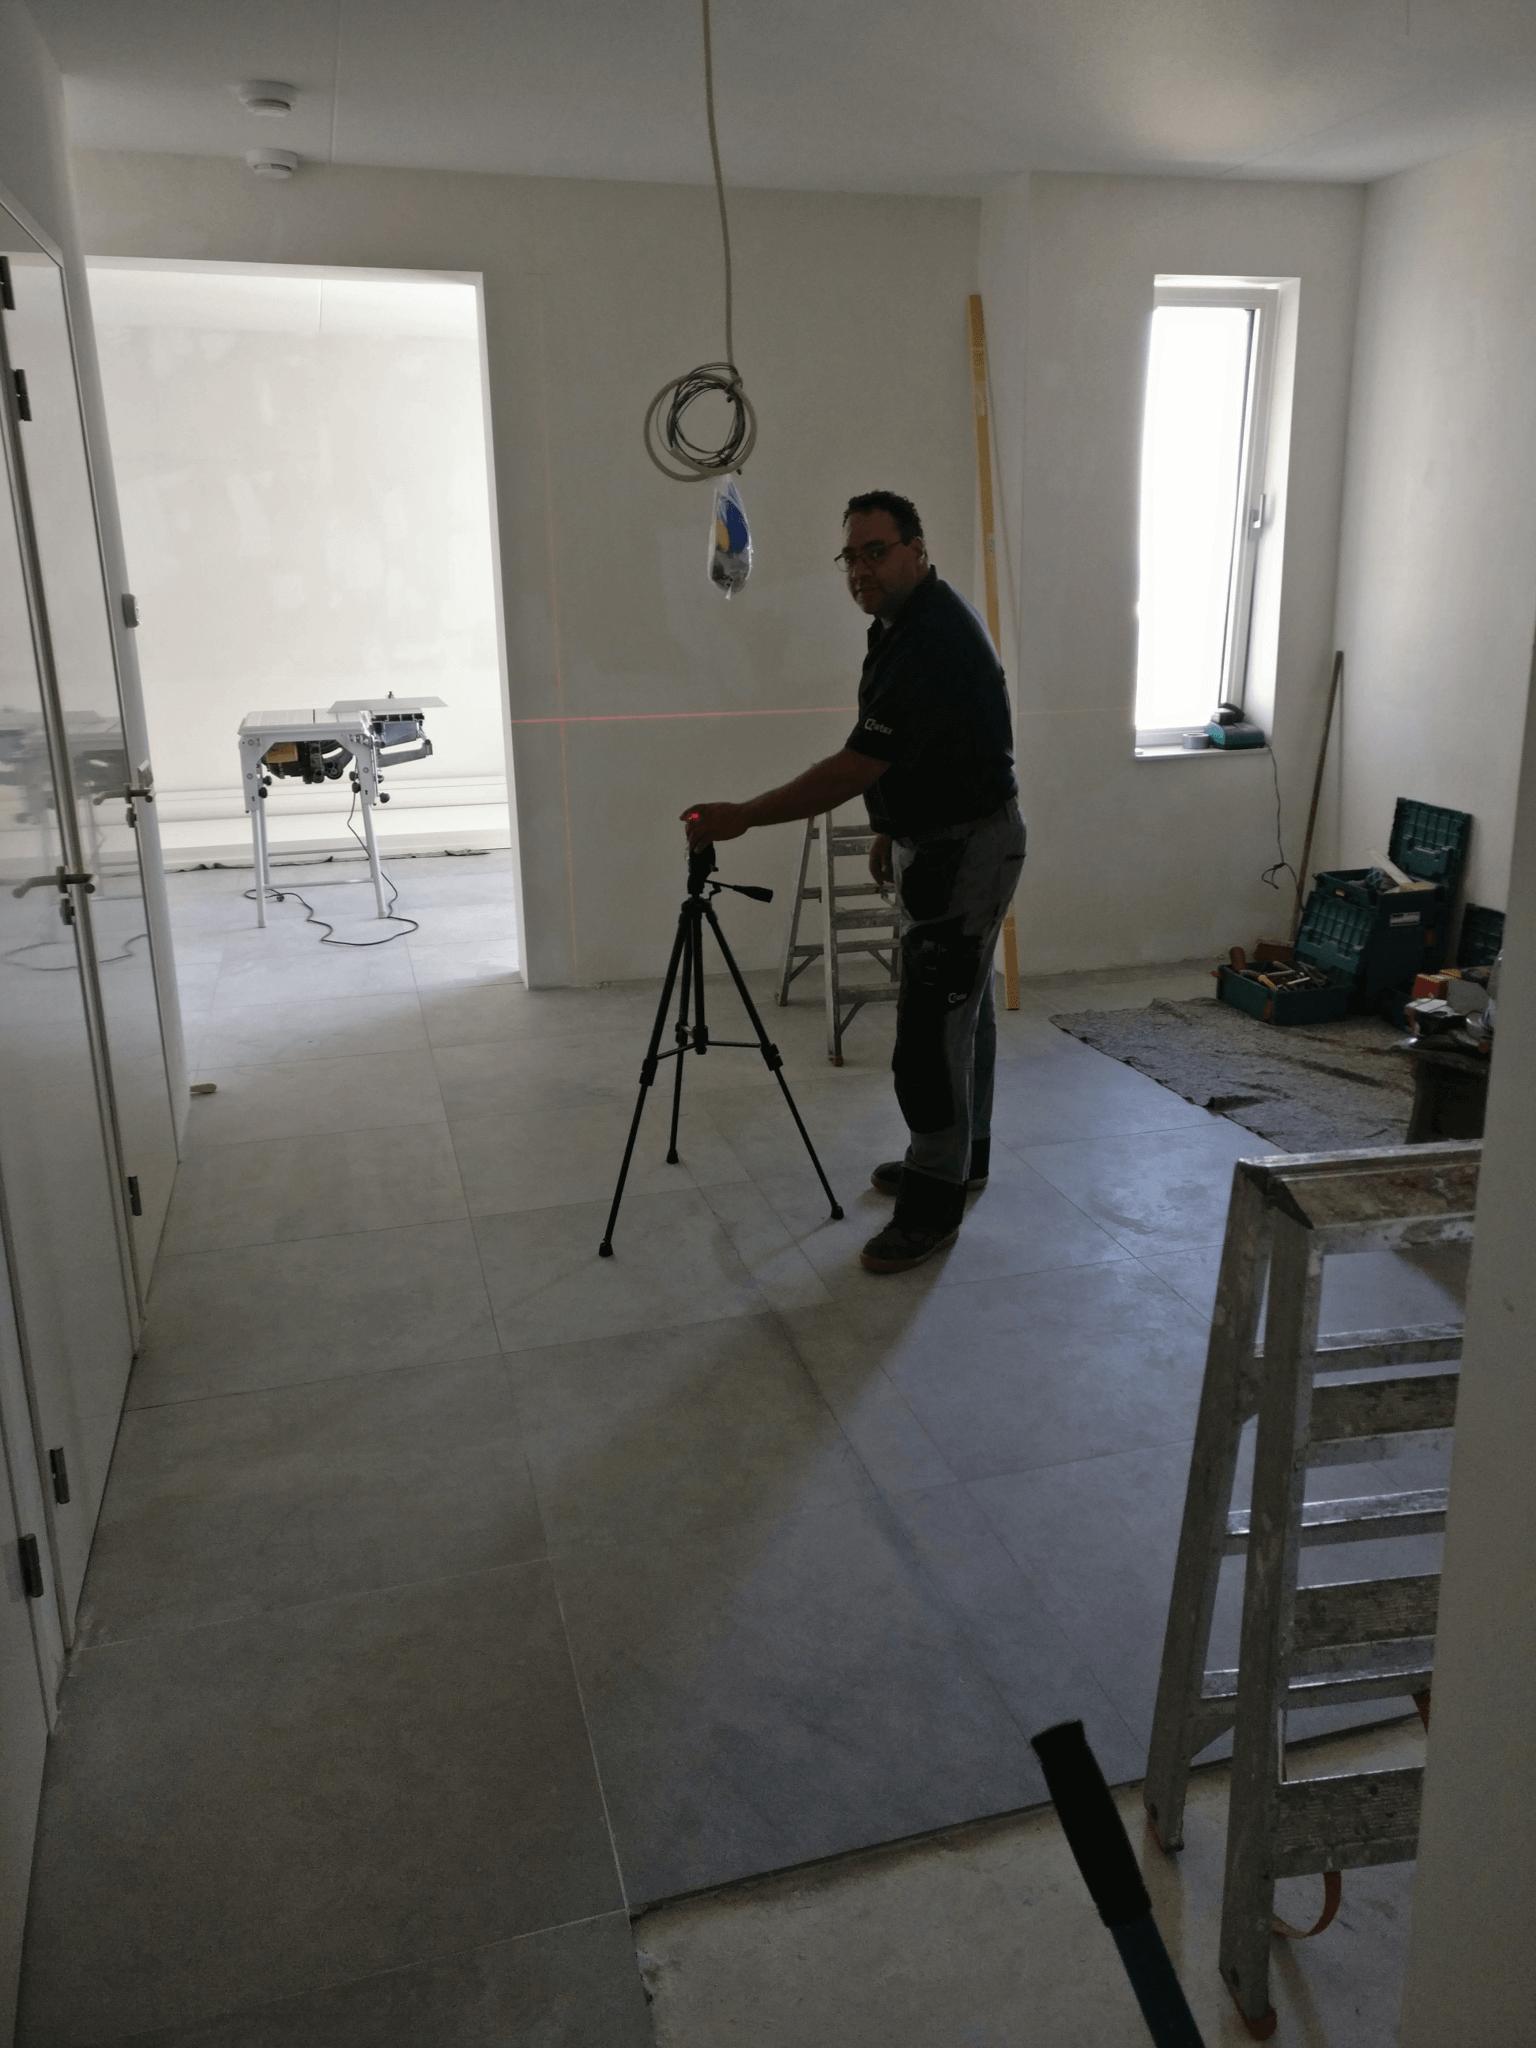 Extra kamer maken door schuifwand op de Zuidas